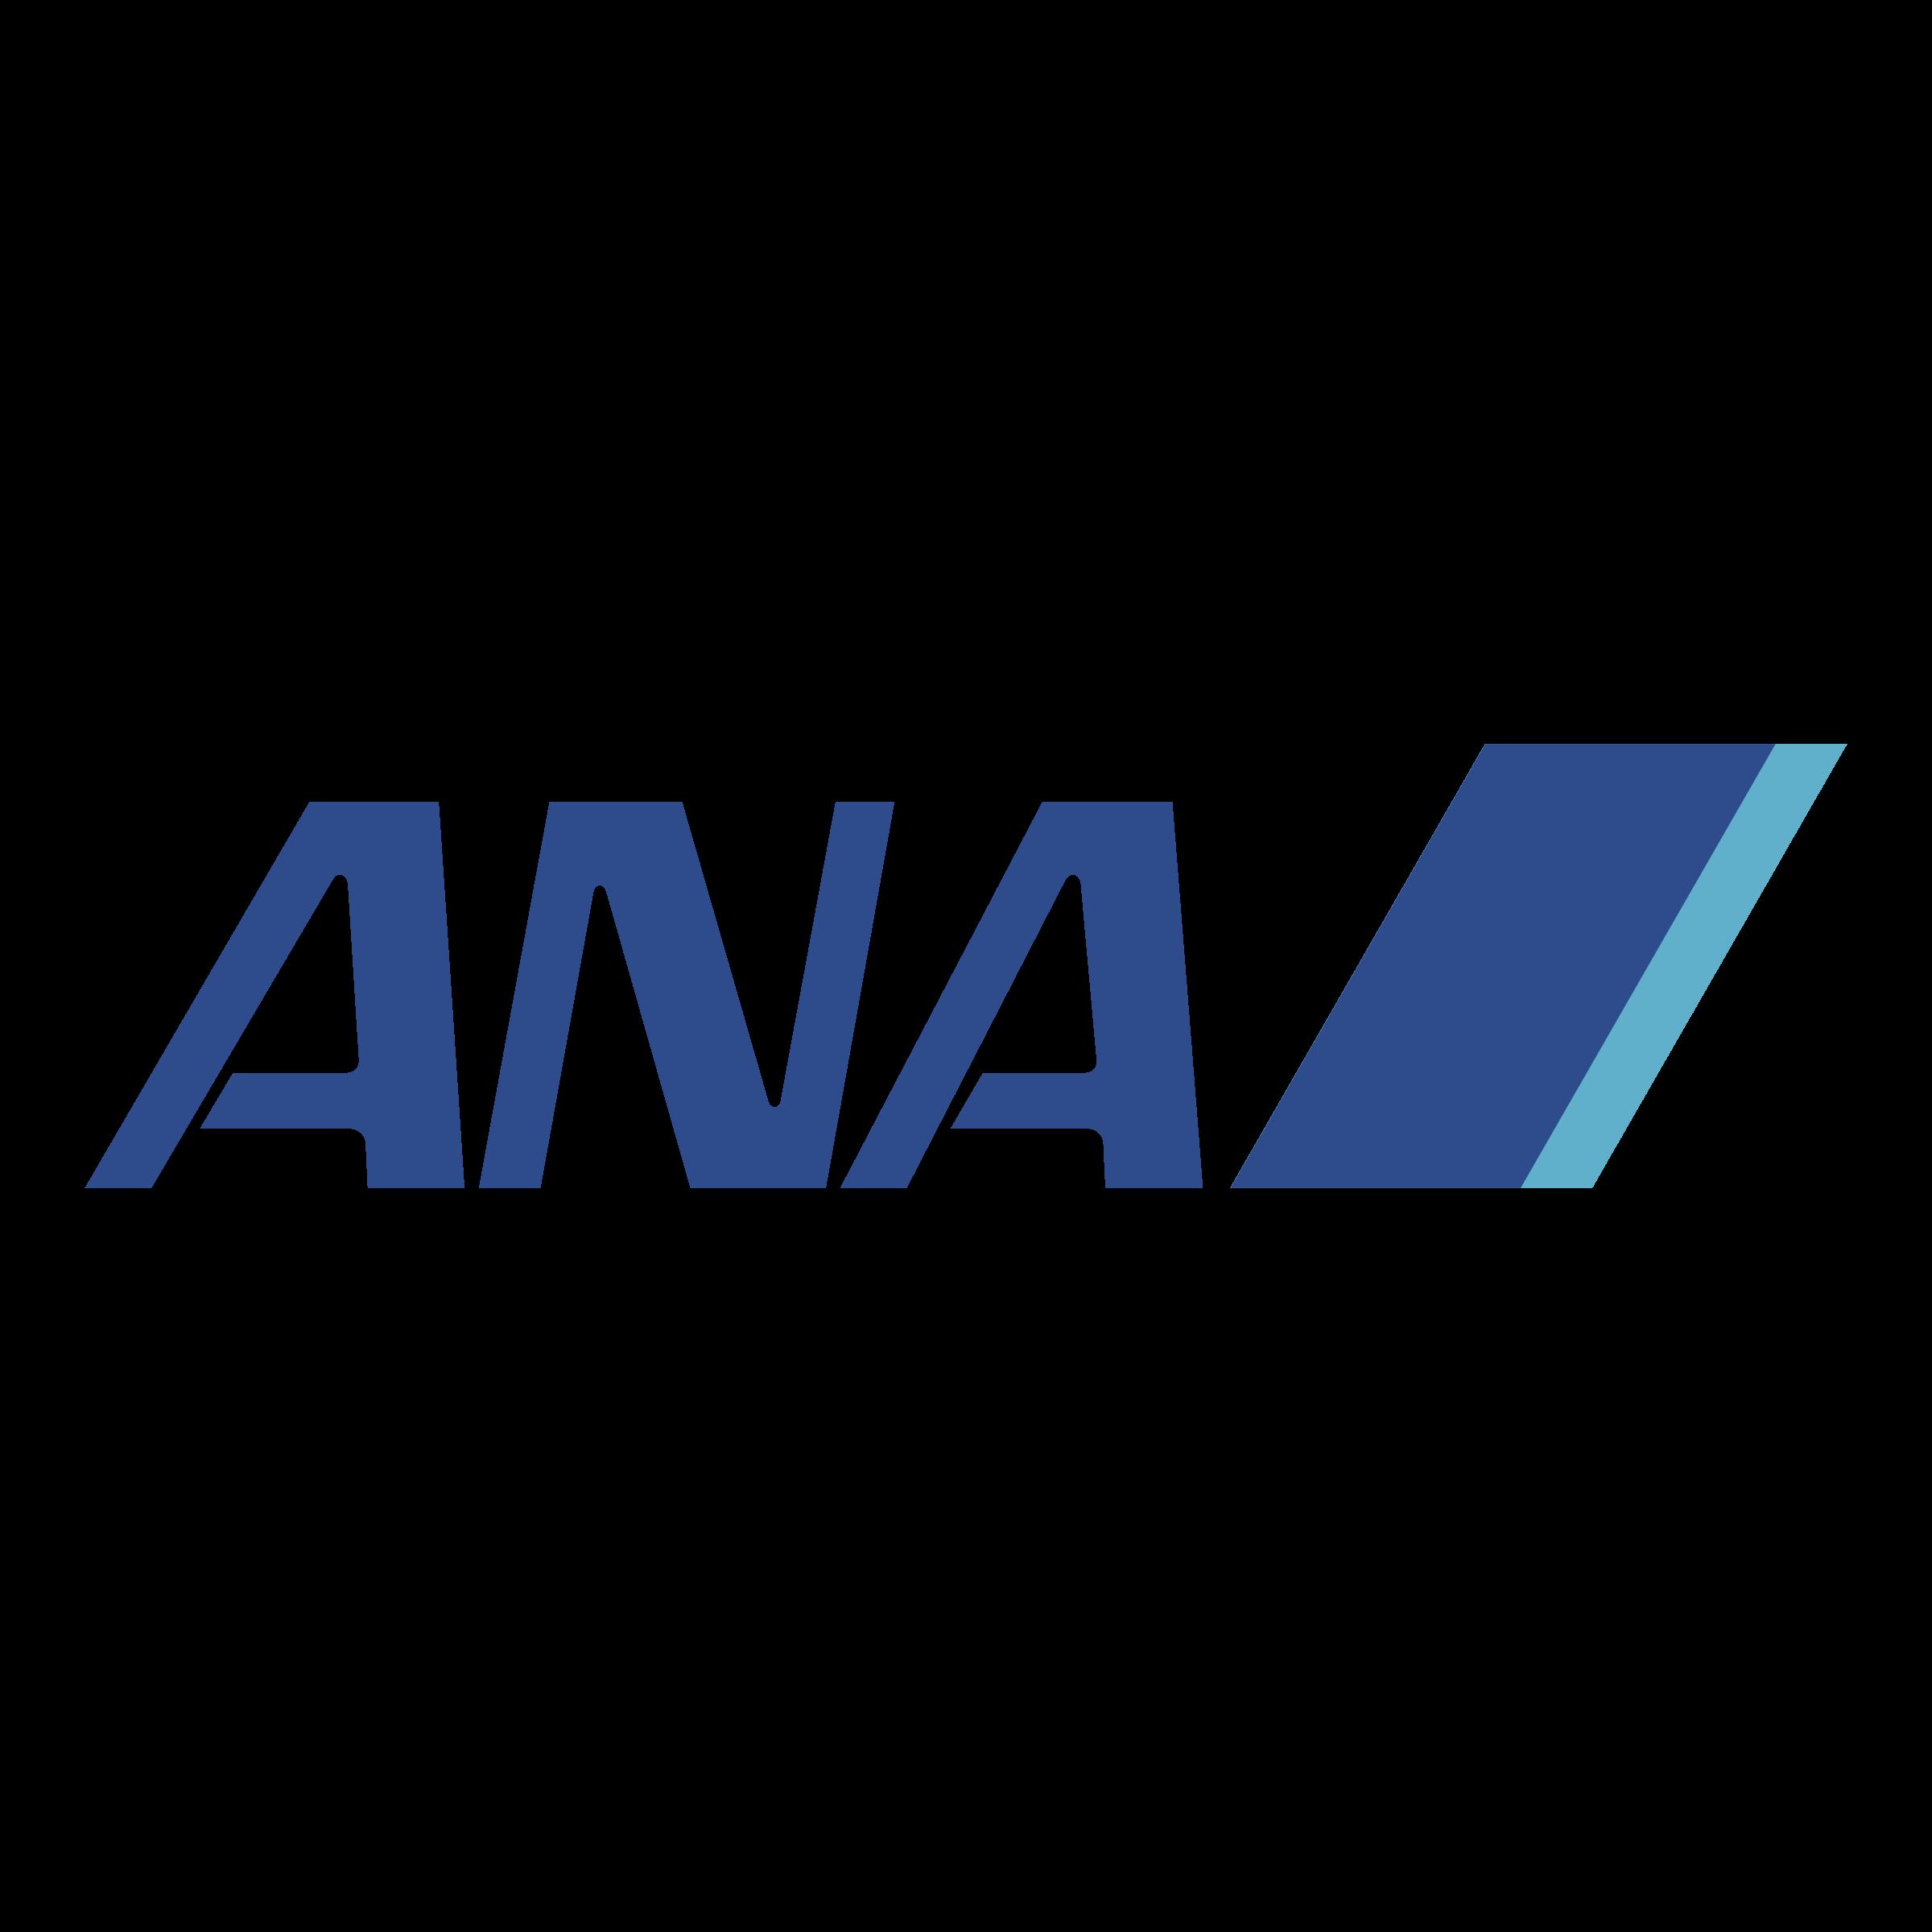 ANA Logo PNG Transparent & SVG Vector.